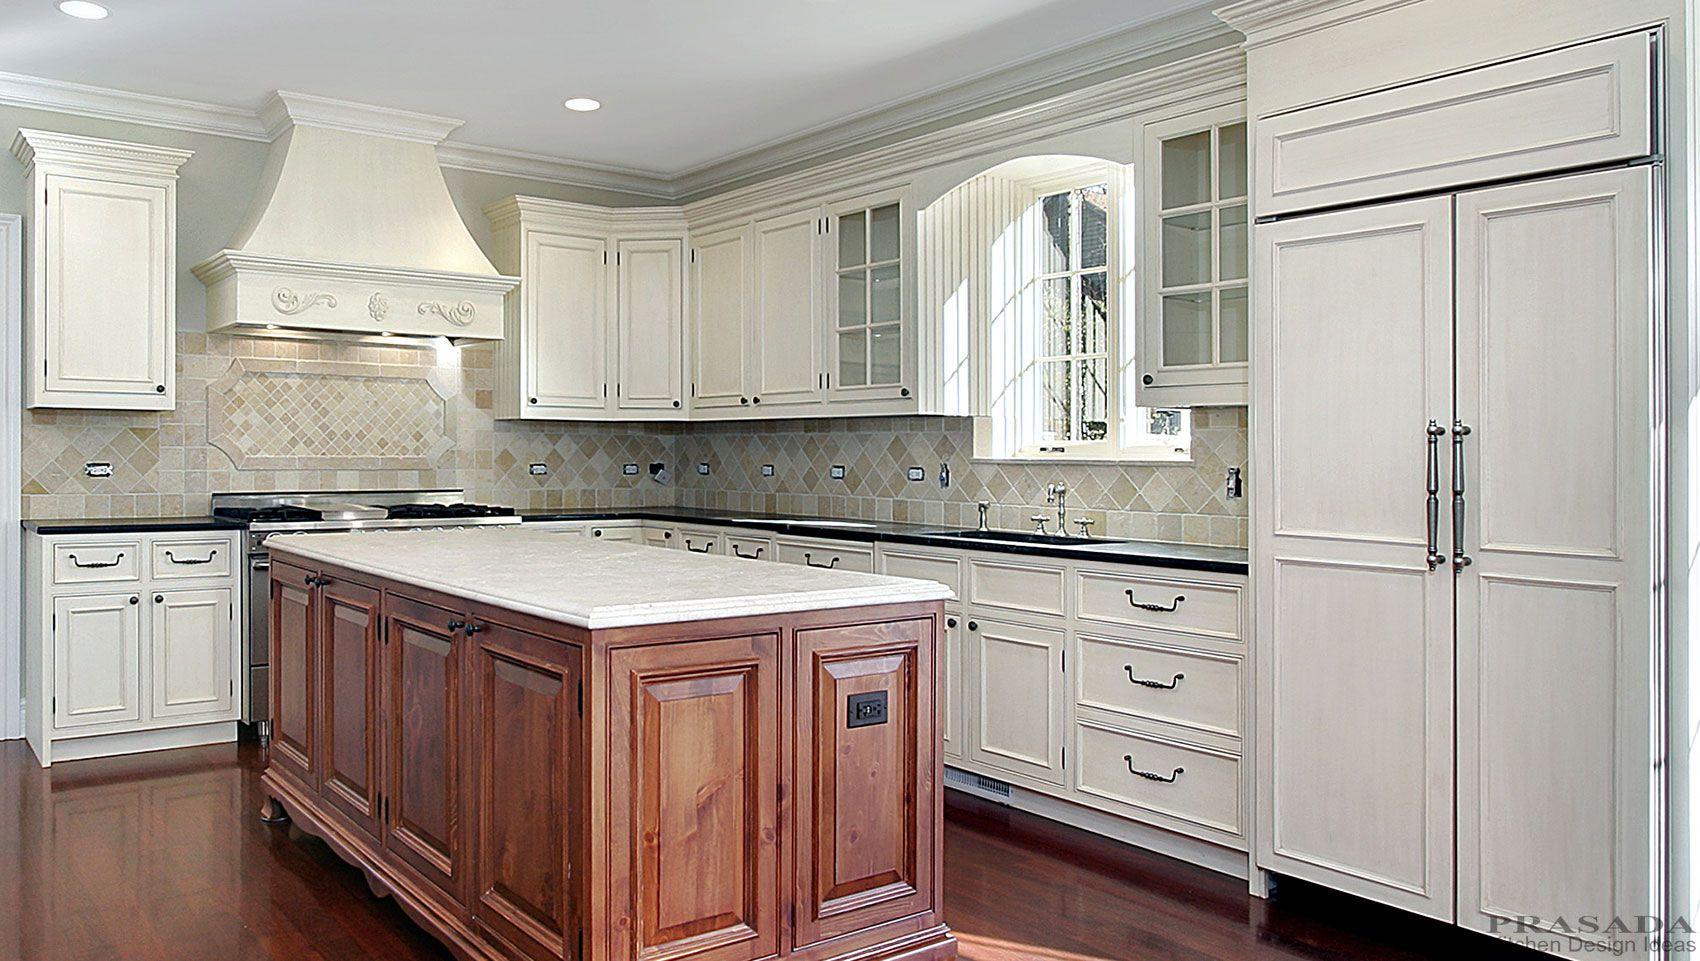 Kitchen Design Ideas Prasada Kitchens And Fine Cabinetry Kitchen Inspiration Design Lake House Kitchen Kitchen Design